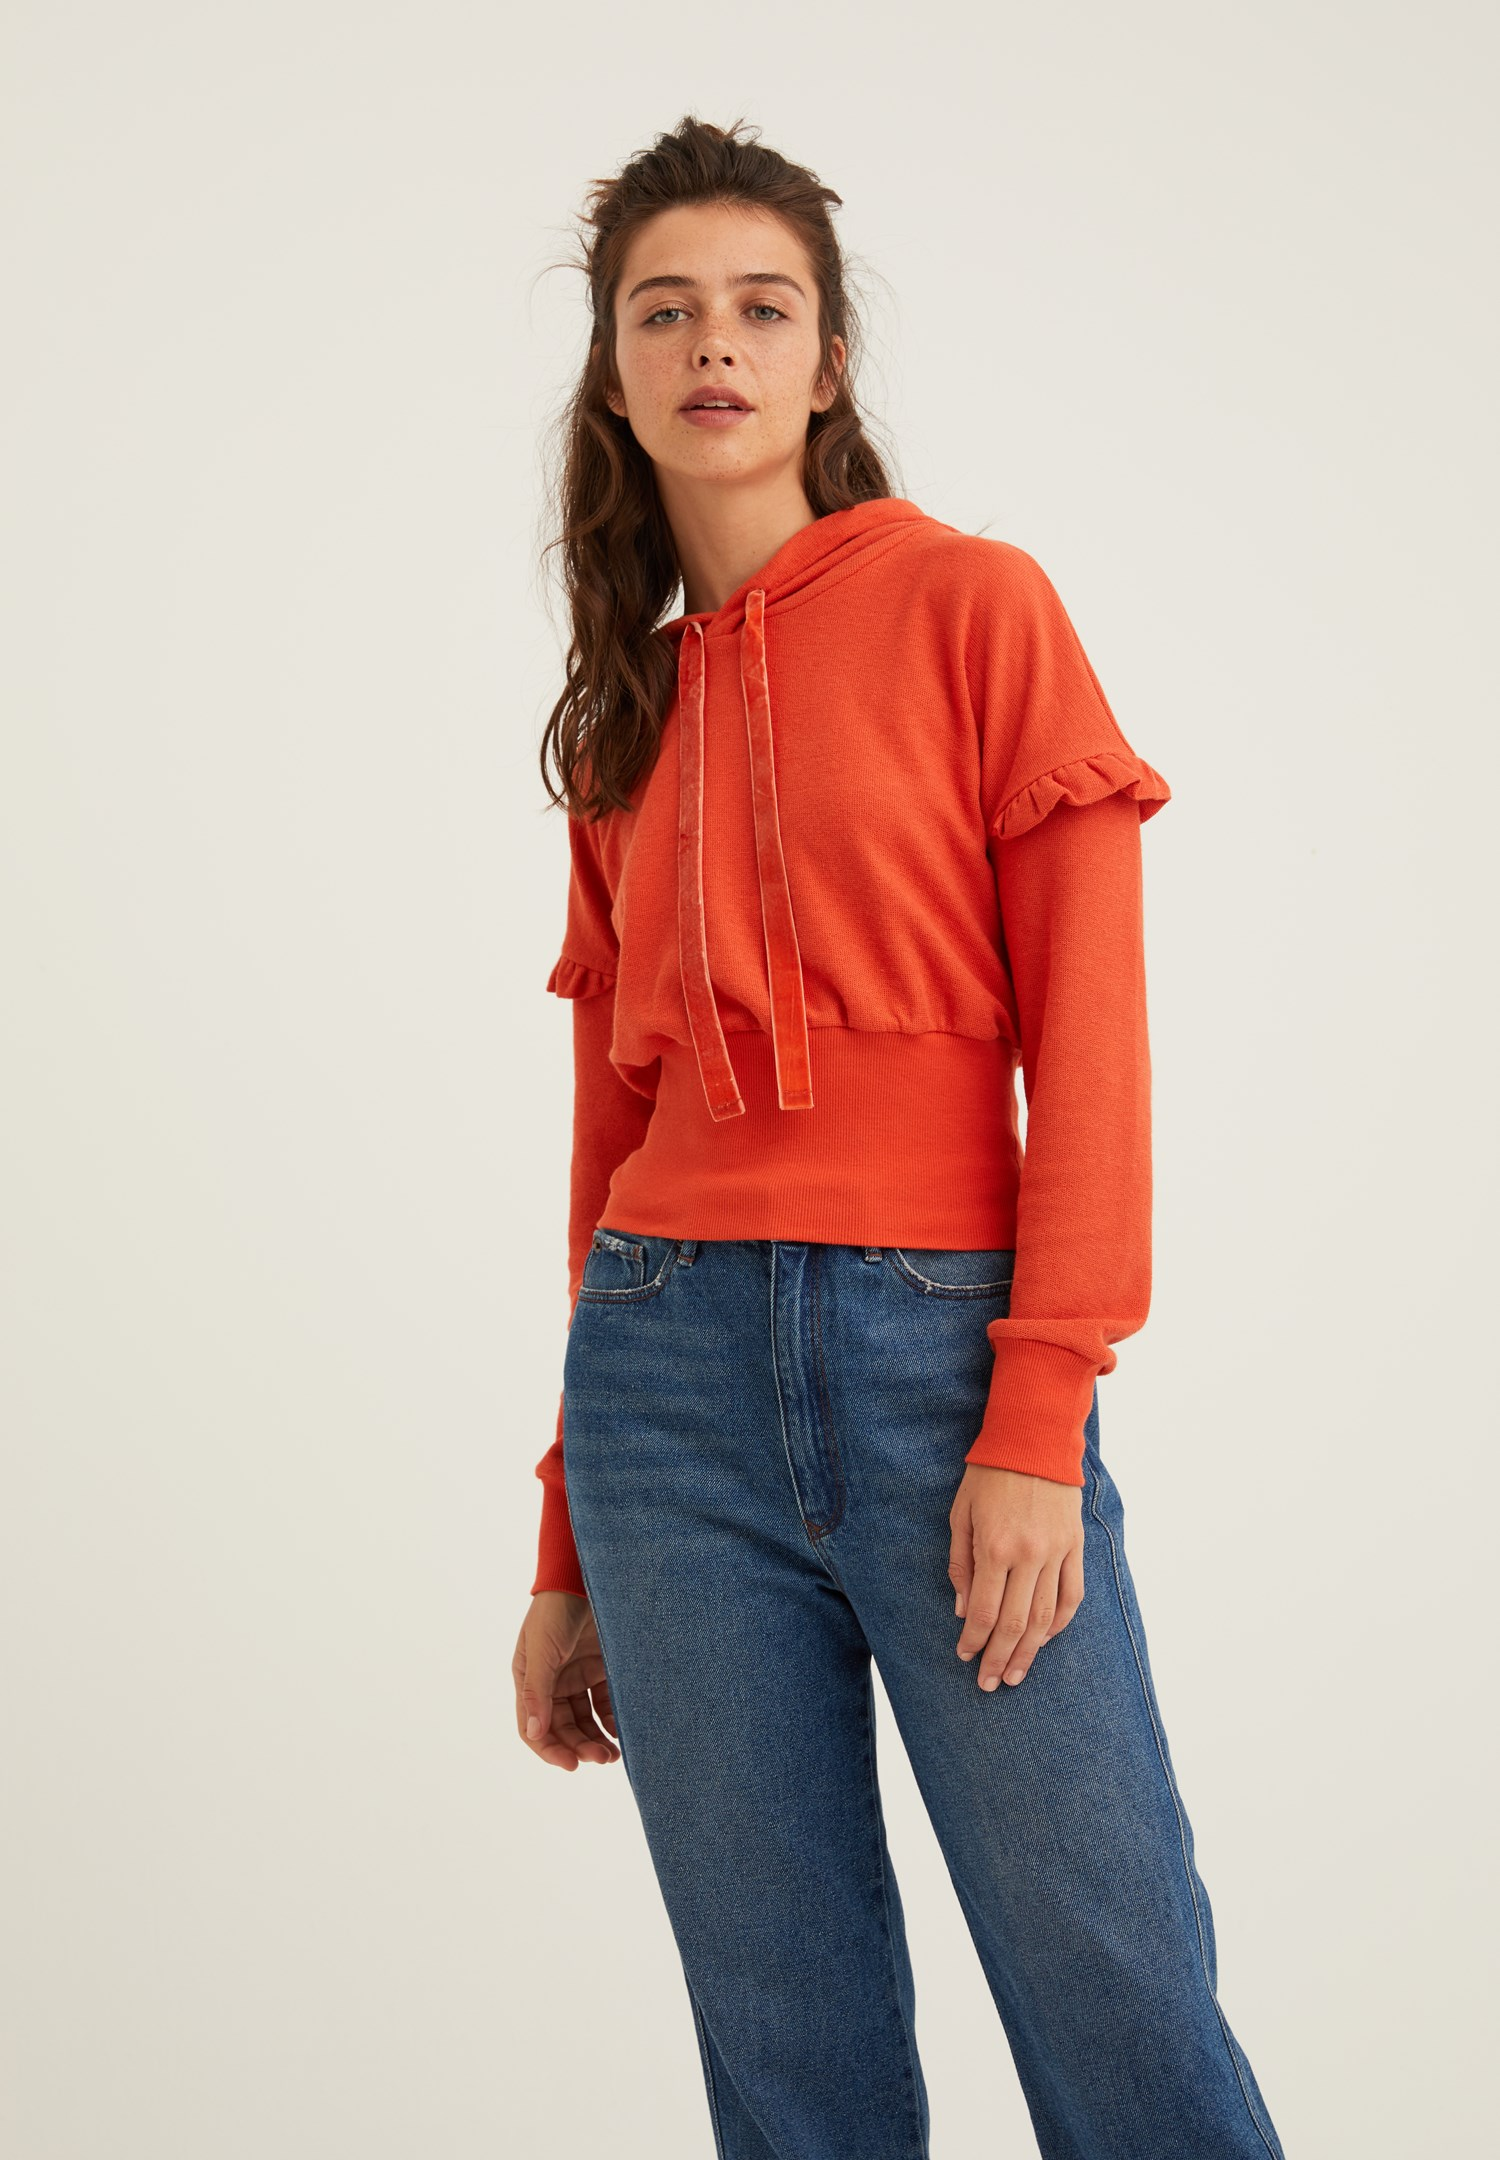 Bayan Turuncu Kol Detaylı Kapüşonlu Sweatshirt